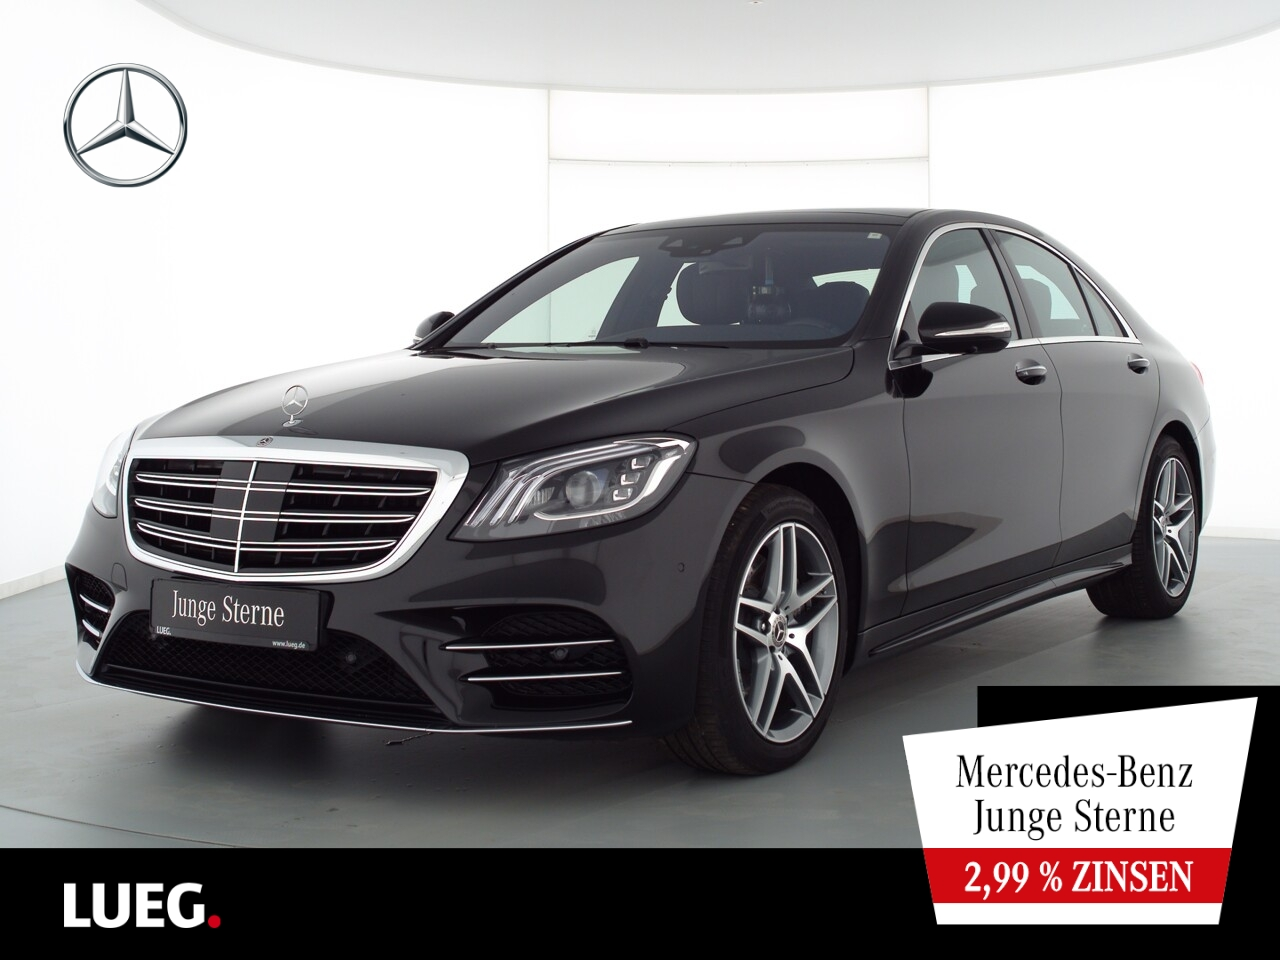 Mercedes-Benz S 350 d 4M COM+Pano+Burm+Mbeam+Sitzkl+Distr+360°, Jahr 2018, Diesel